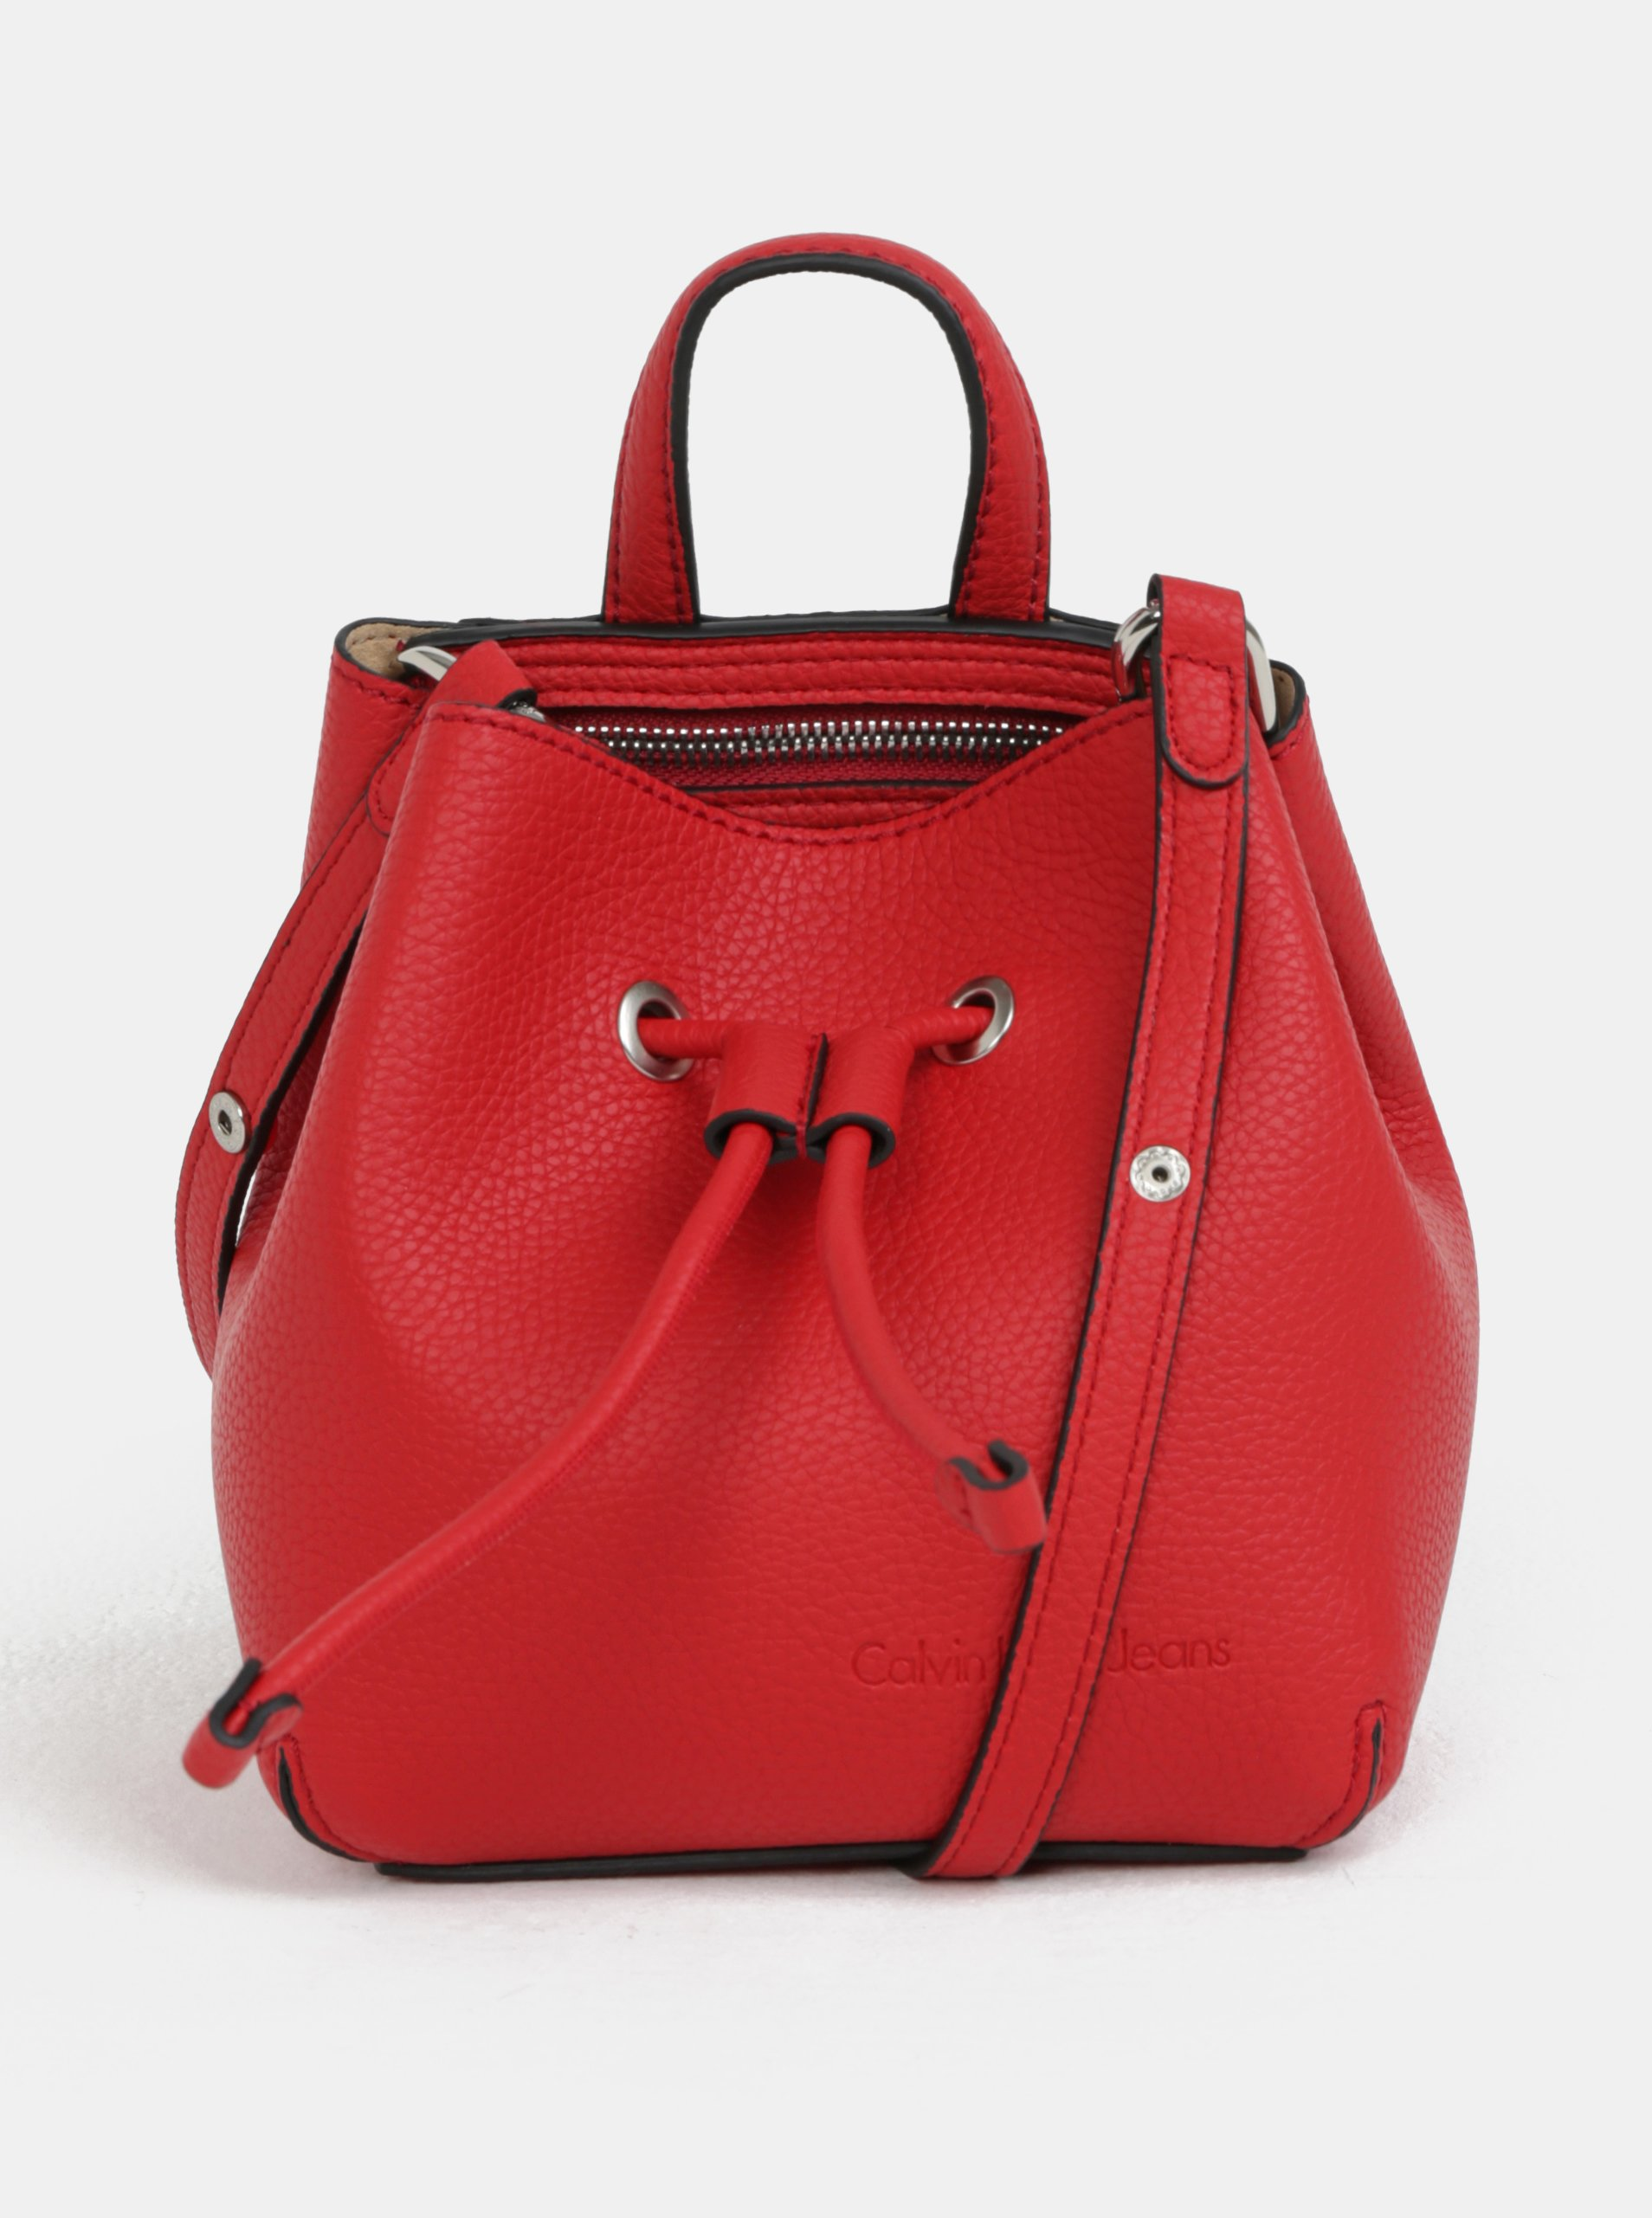 5390dd395 Červená malá koženková vaková kabelka Calvin Klein Jeans | Moda.sk